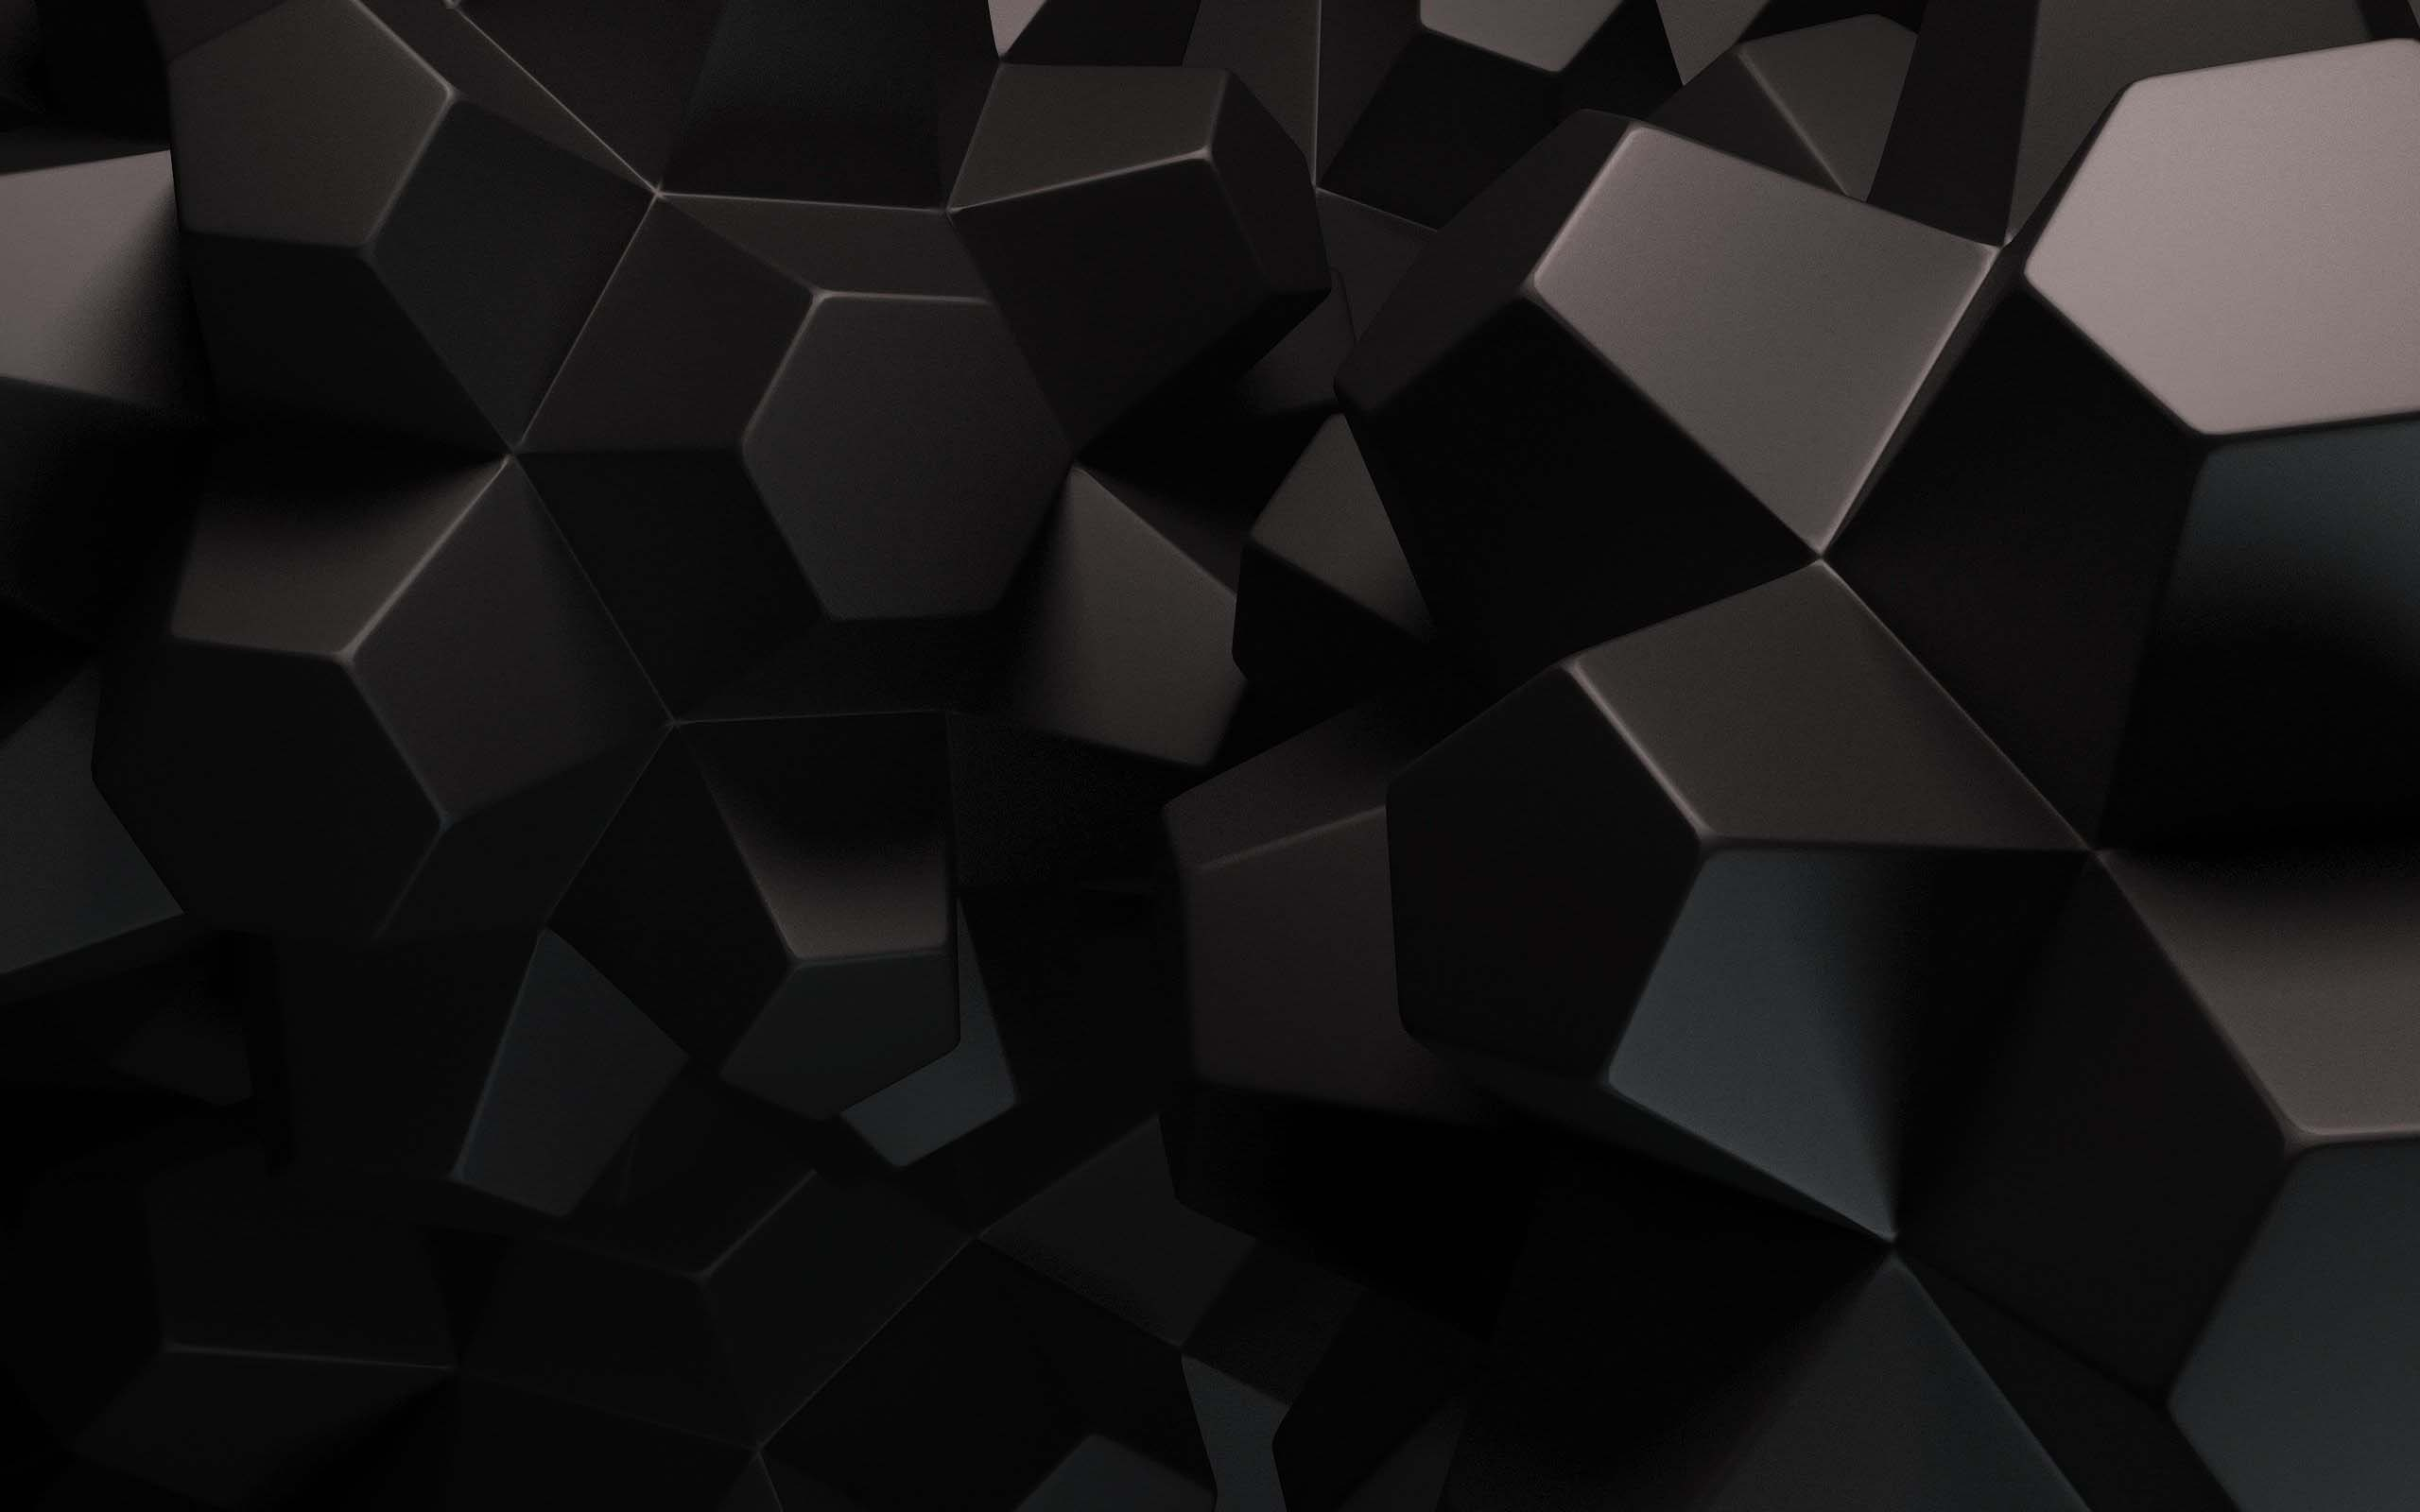 Hình nền đen 3D